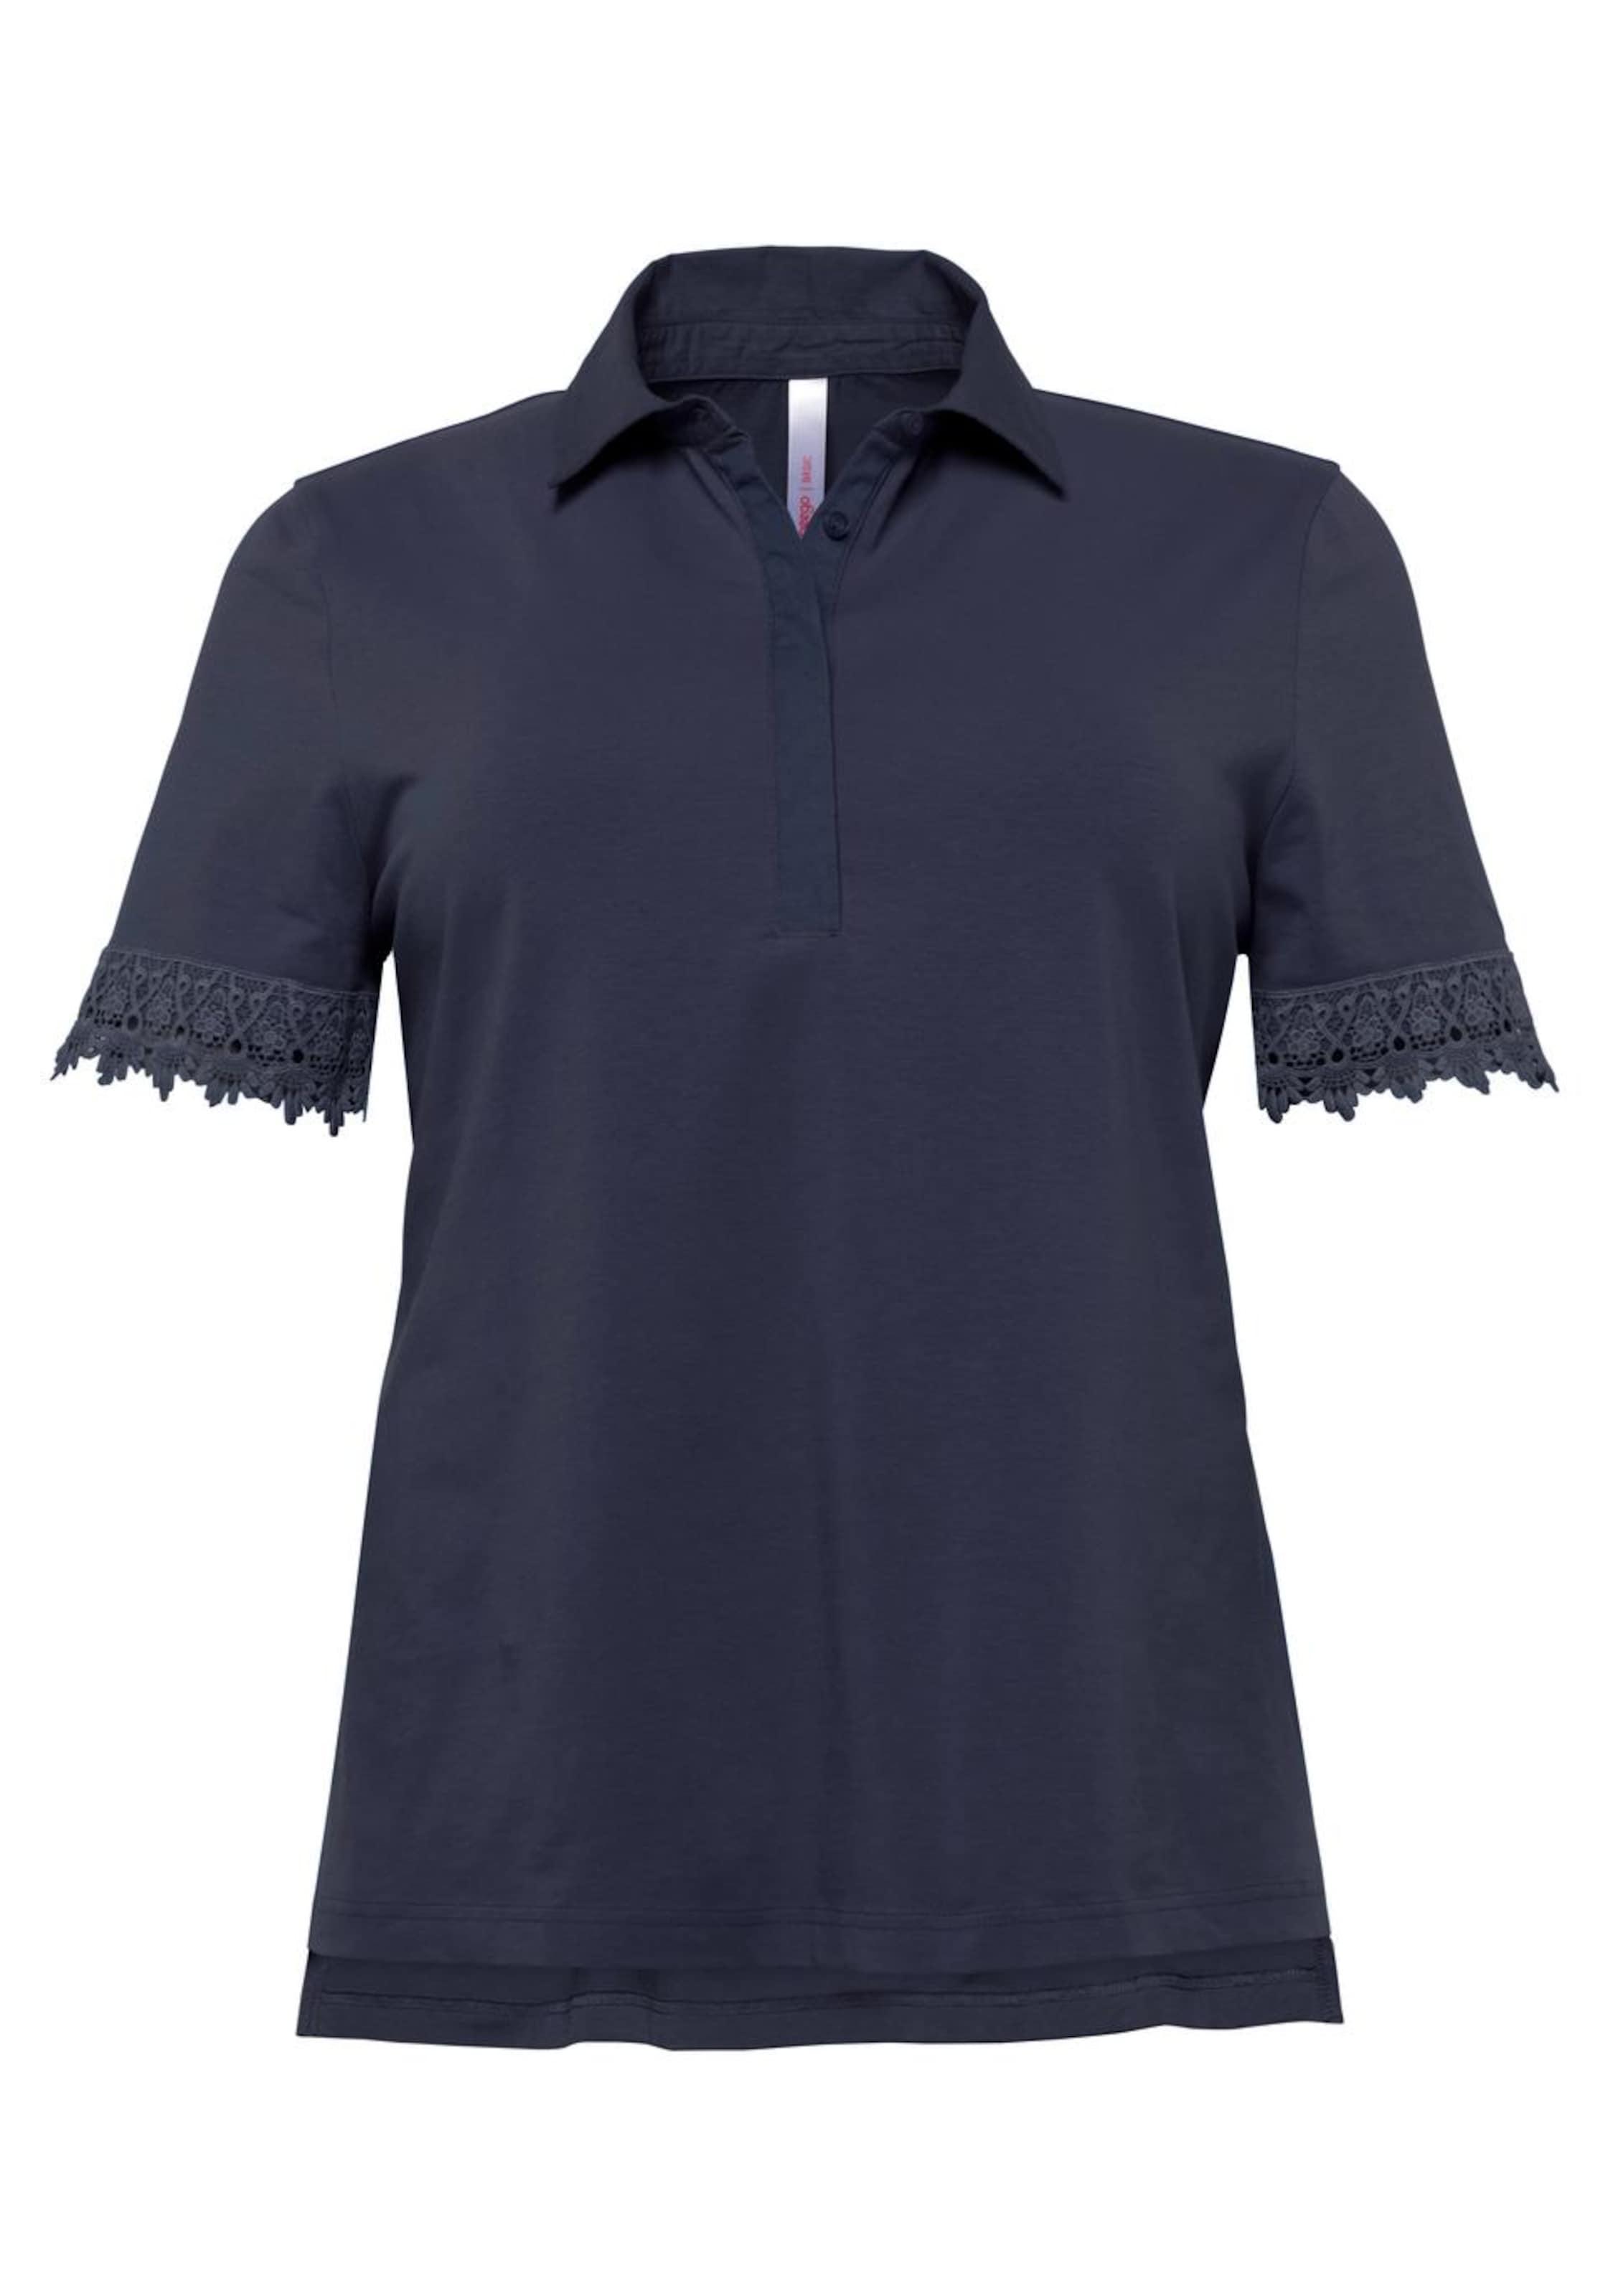 001eb282fb49 Casual T shirt Sheego Marine In PiOXwTkZu